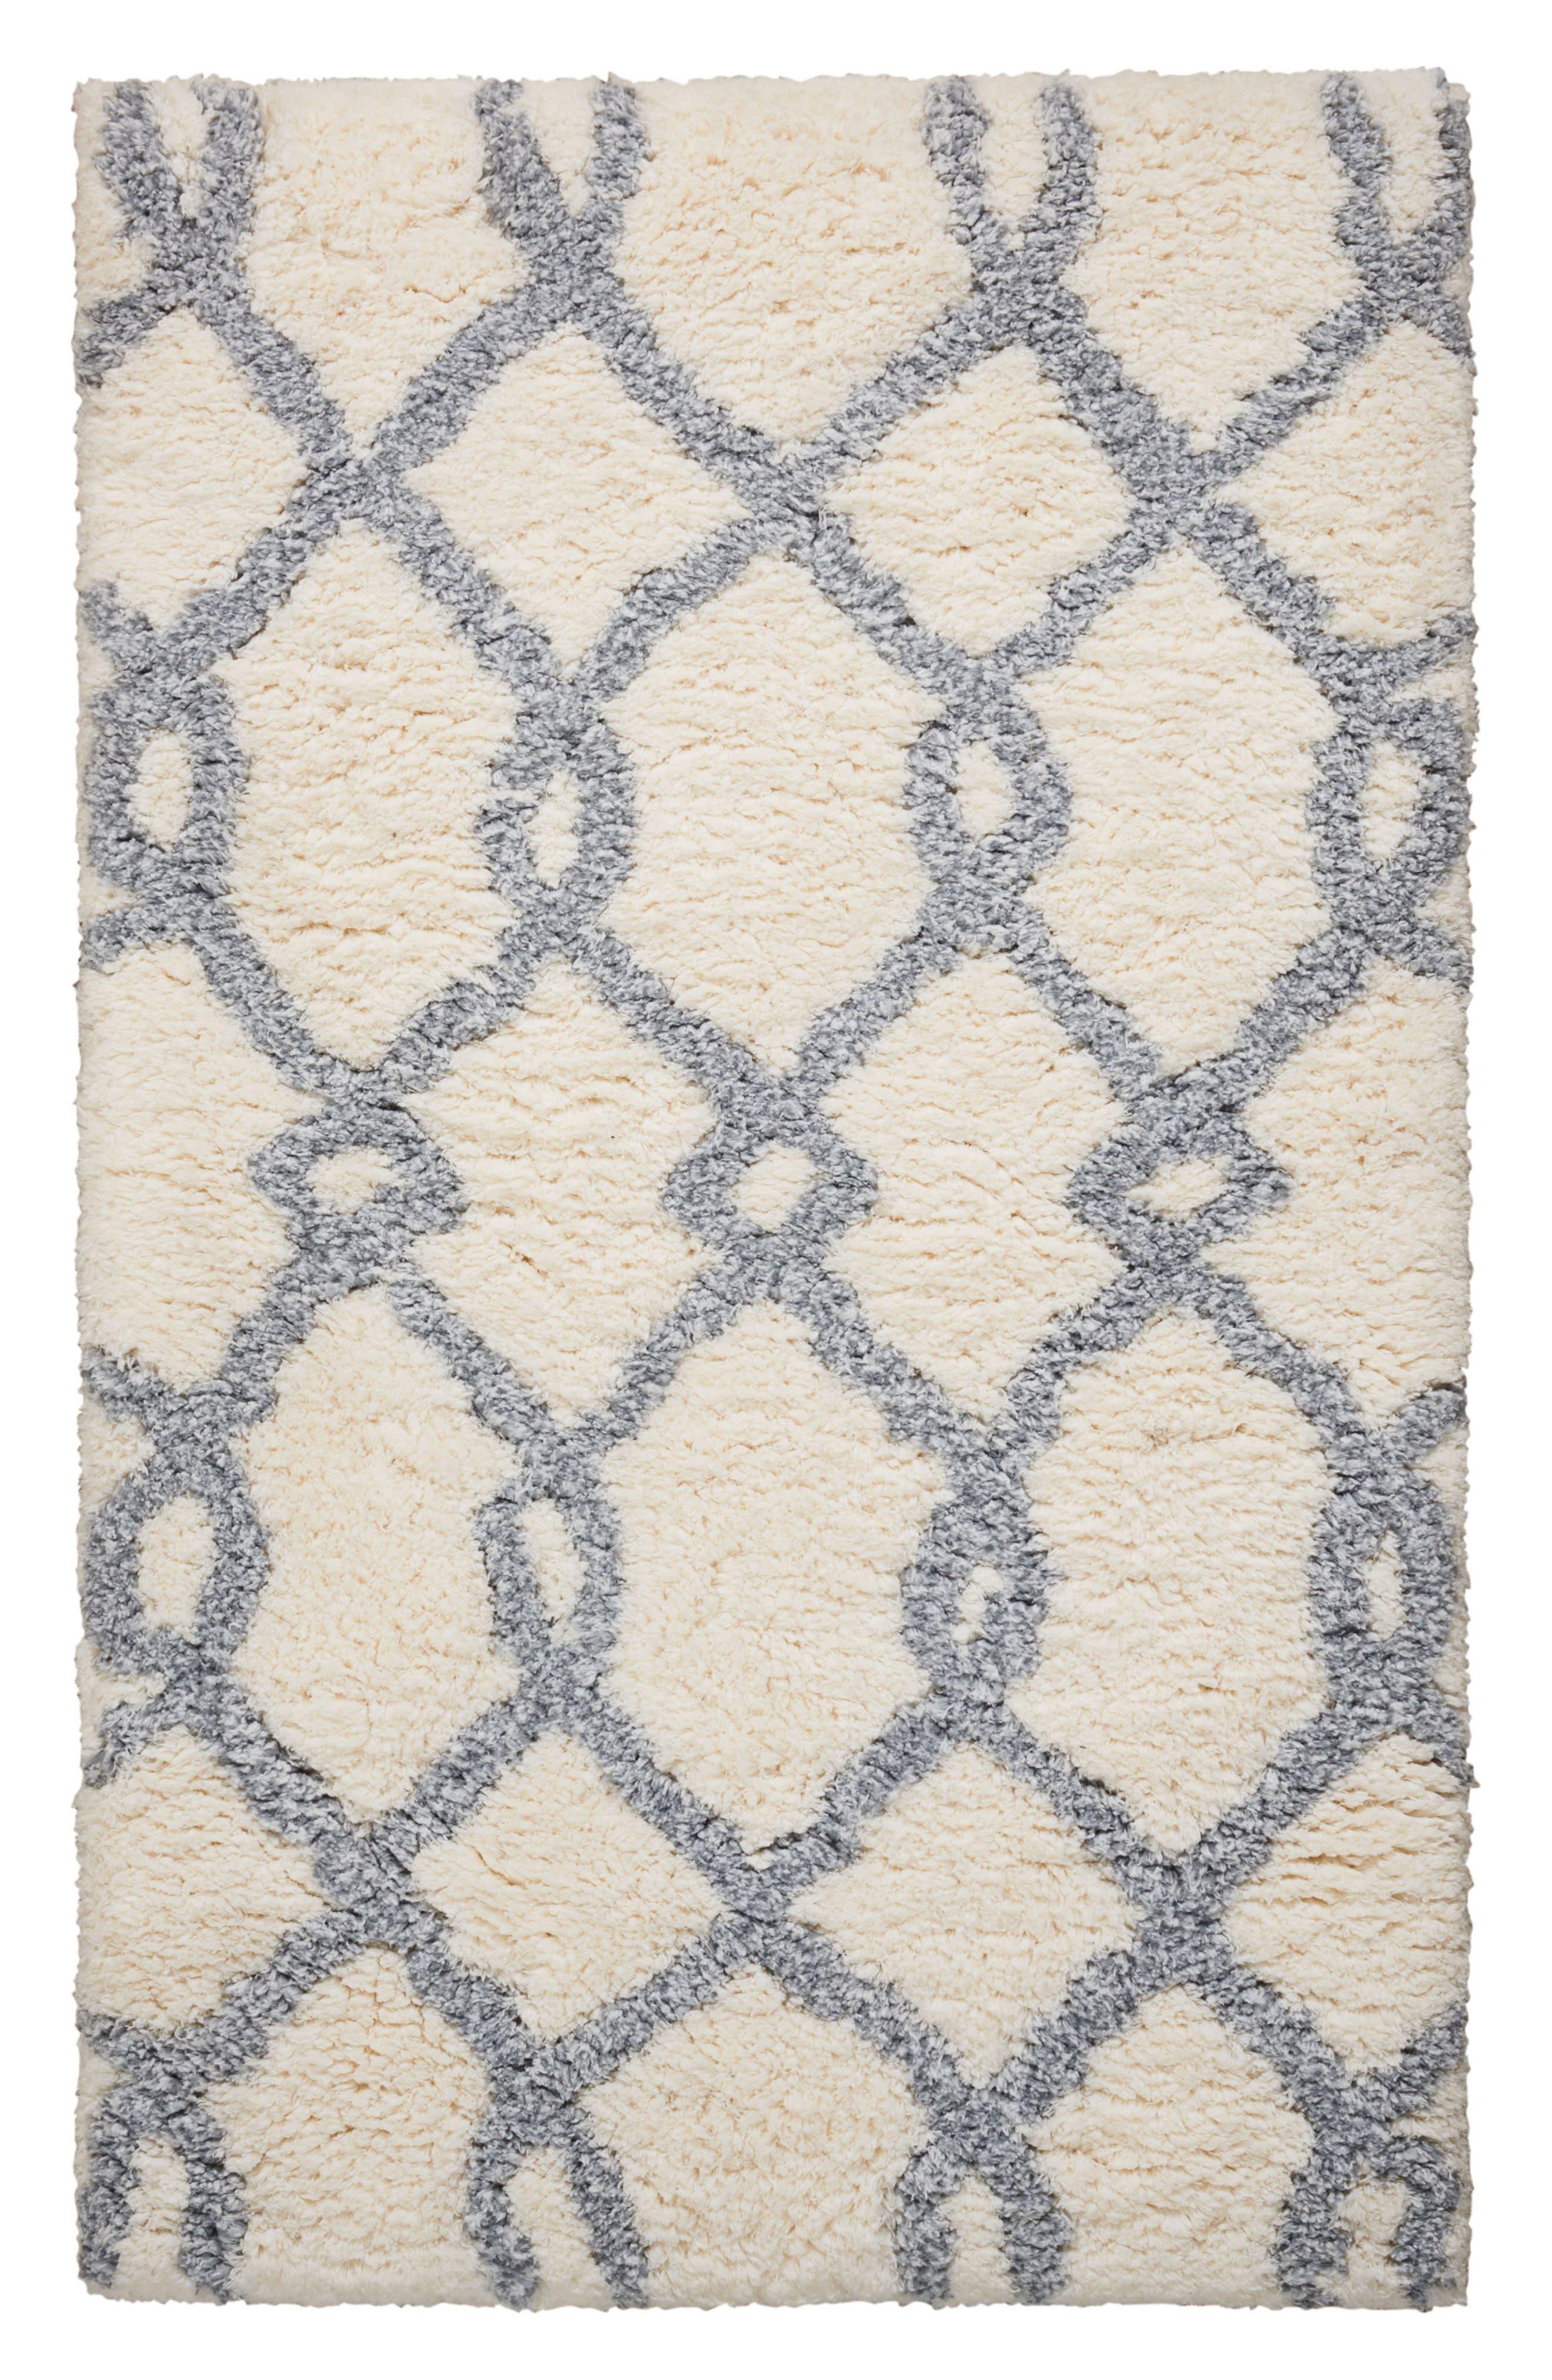 Stitch Rug,                         Main,                         color, Ivory Blue